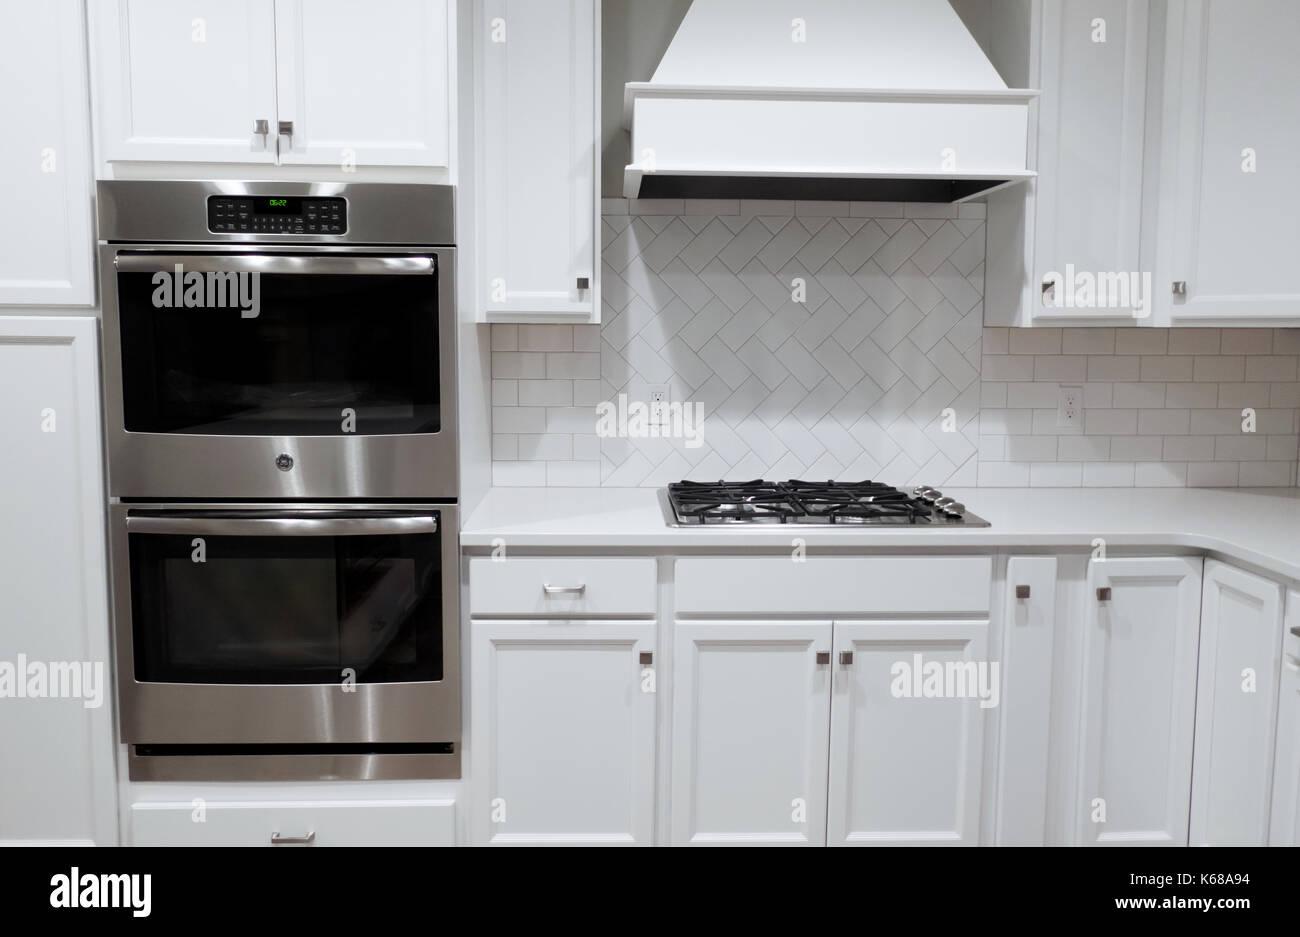 kche edelstahl great wanddeko kuche wanddeko ka che. Black Bedroom Furniture Sets. Home Design Ideas